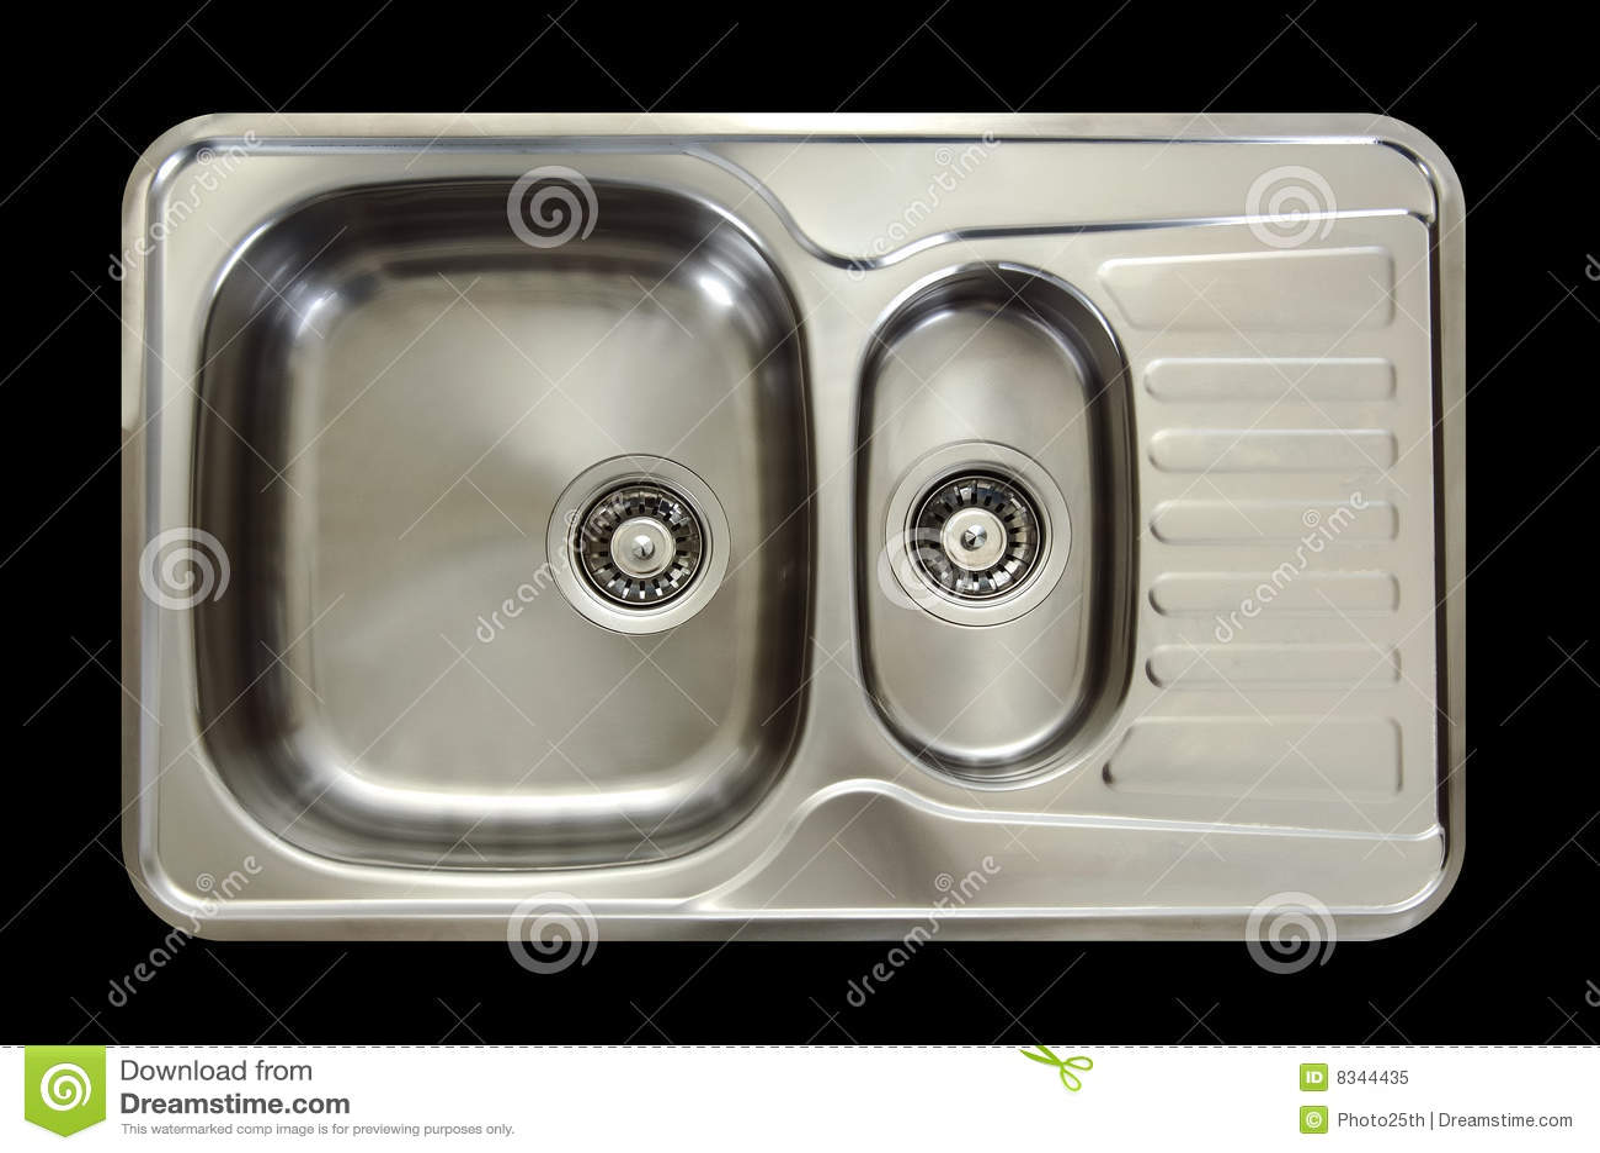 Washbasin Royalty Free Stock Photo  Image 8344435 # Chromen Wasbak_141815